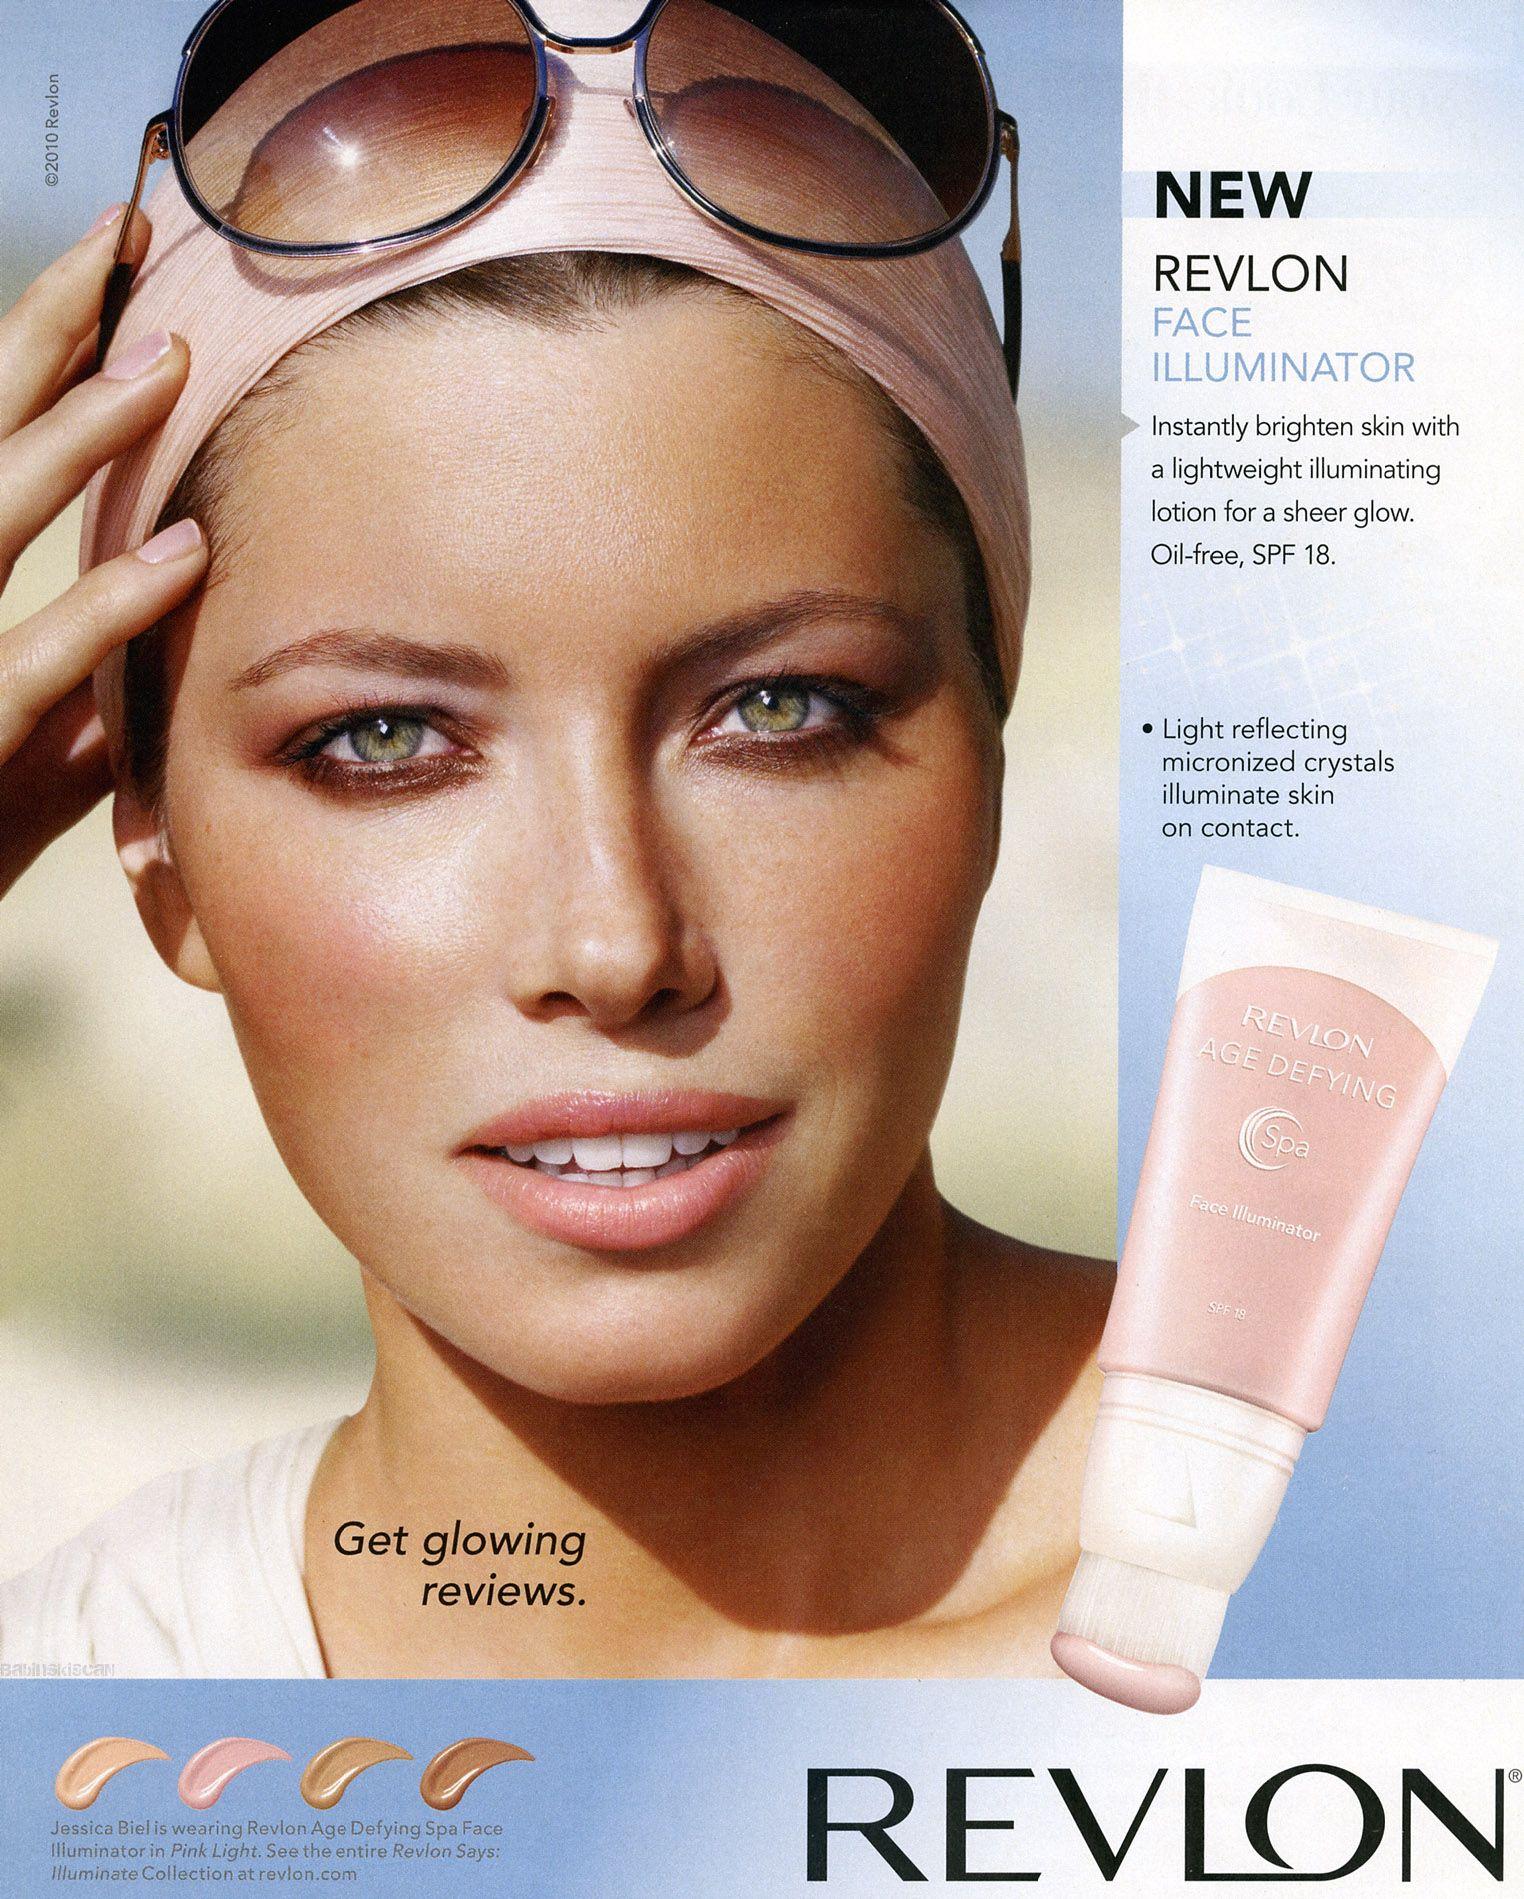 revlon ad - Google Search | ADVERTS: makeup ads | Pinterest ...